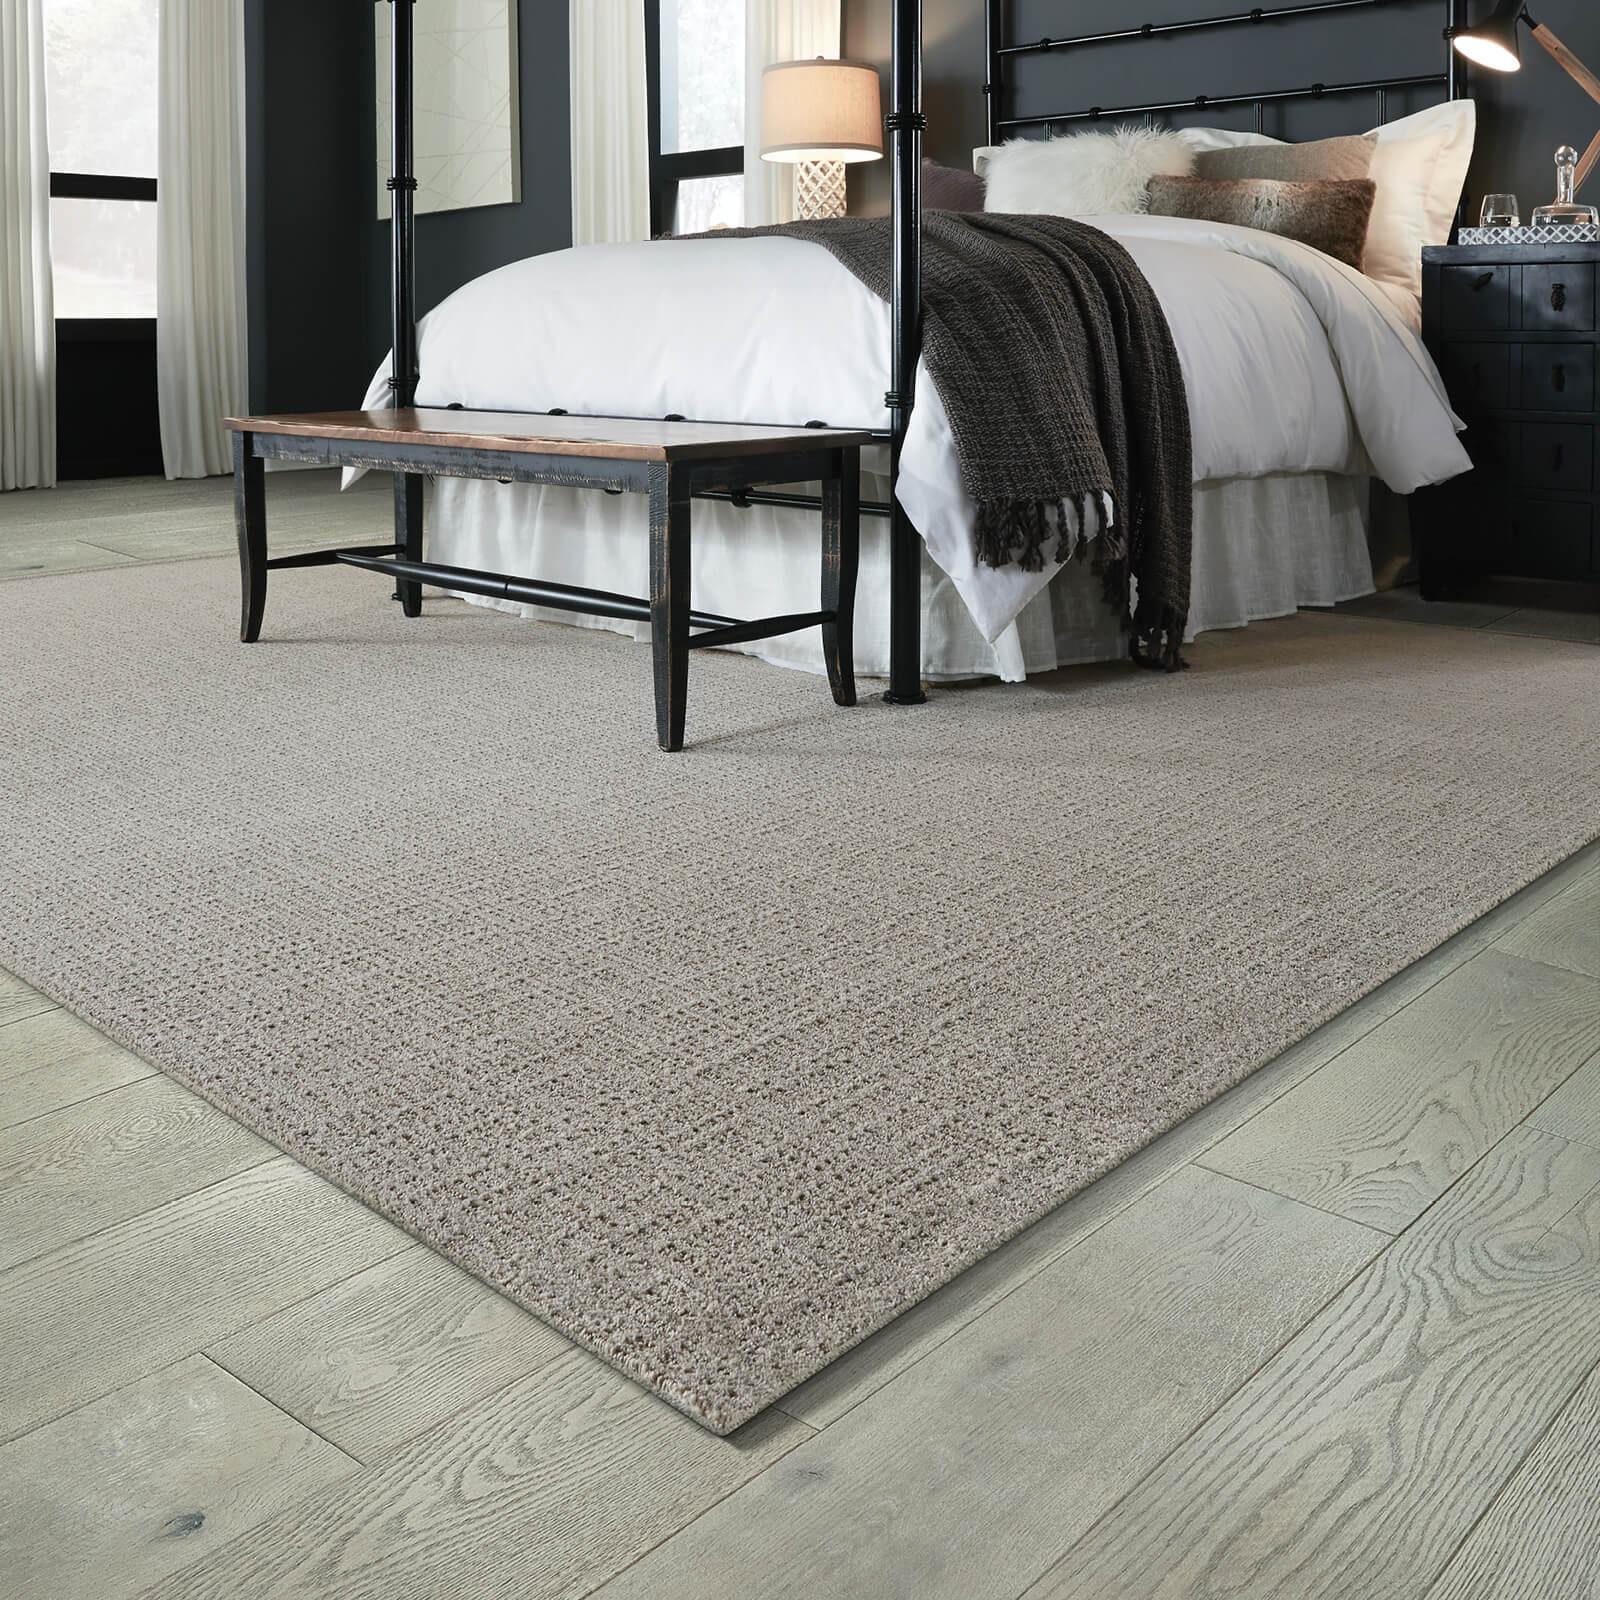 Custom Area Rug | The Flooring Place